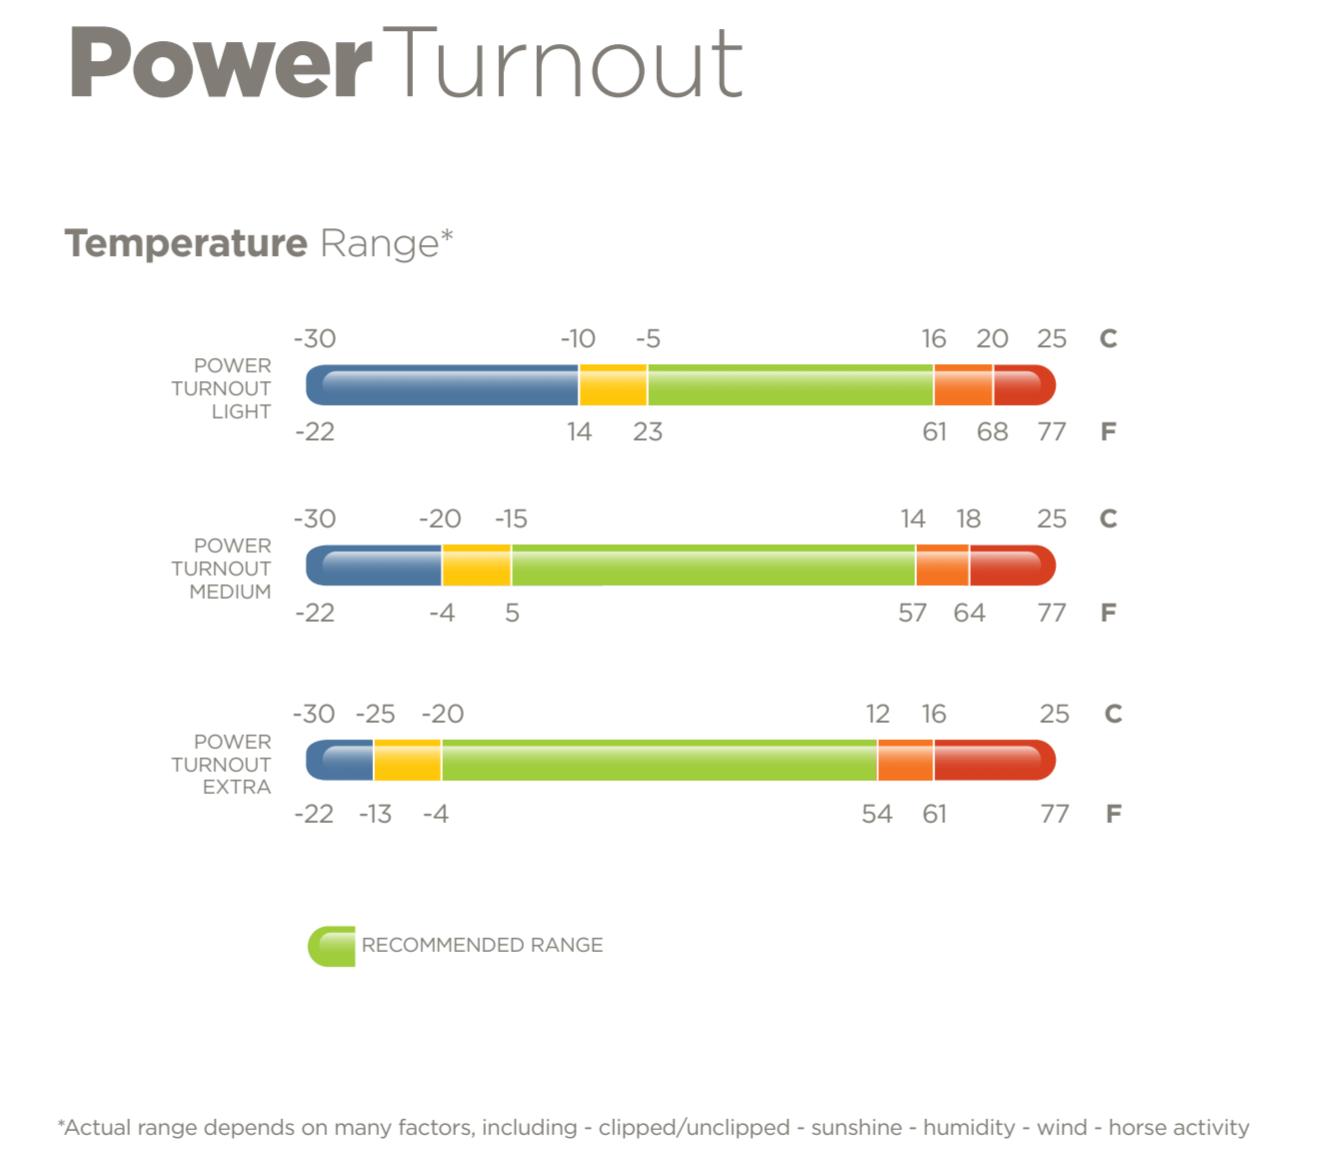 Temperaturen range bucas power turnout